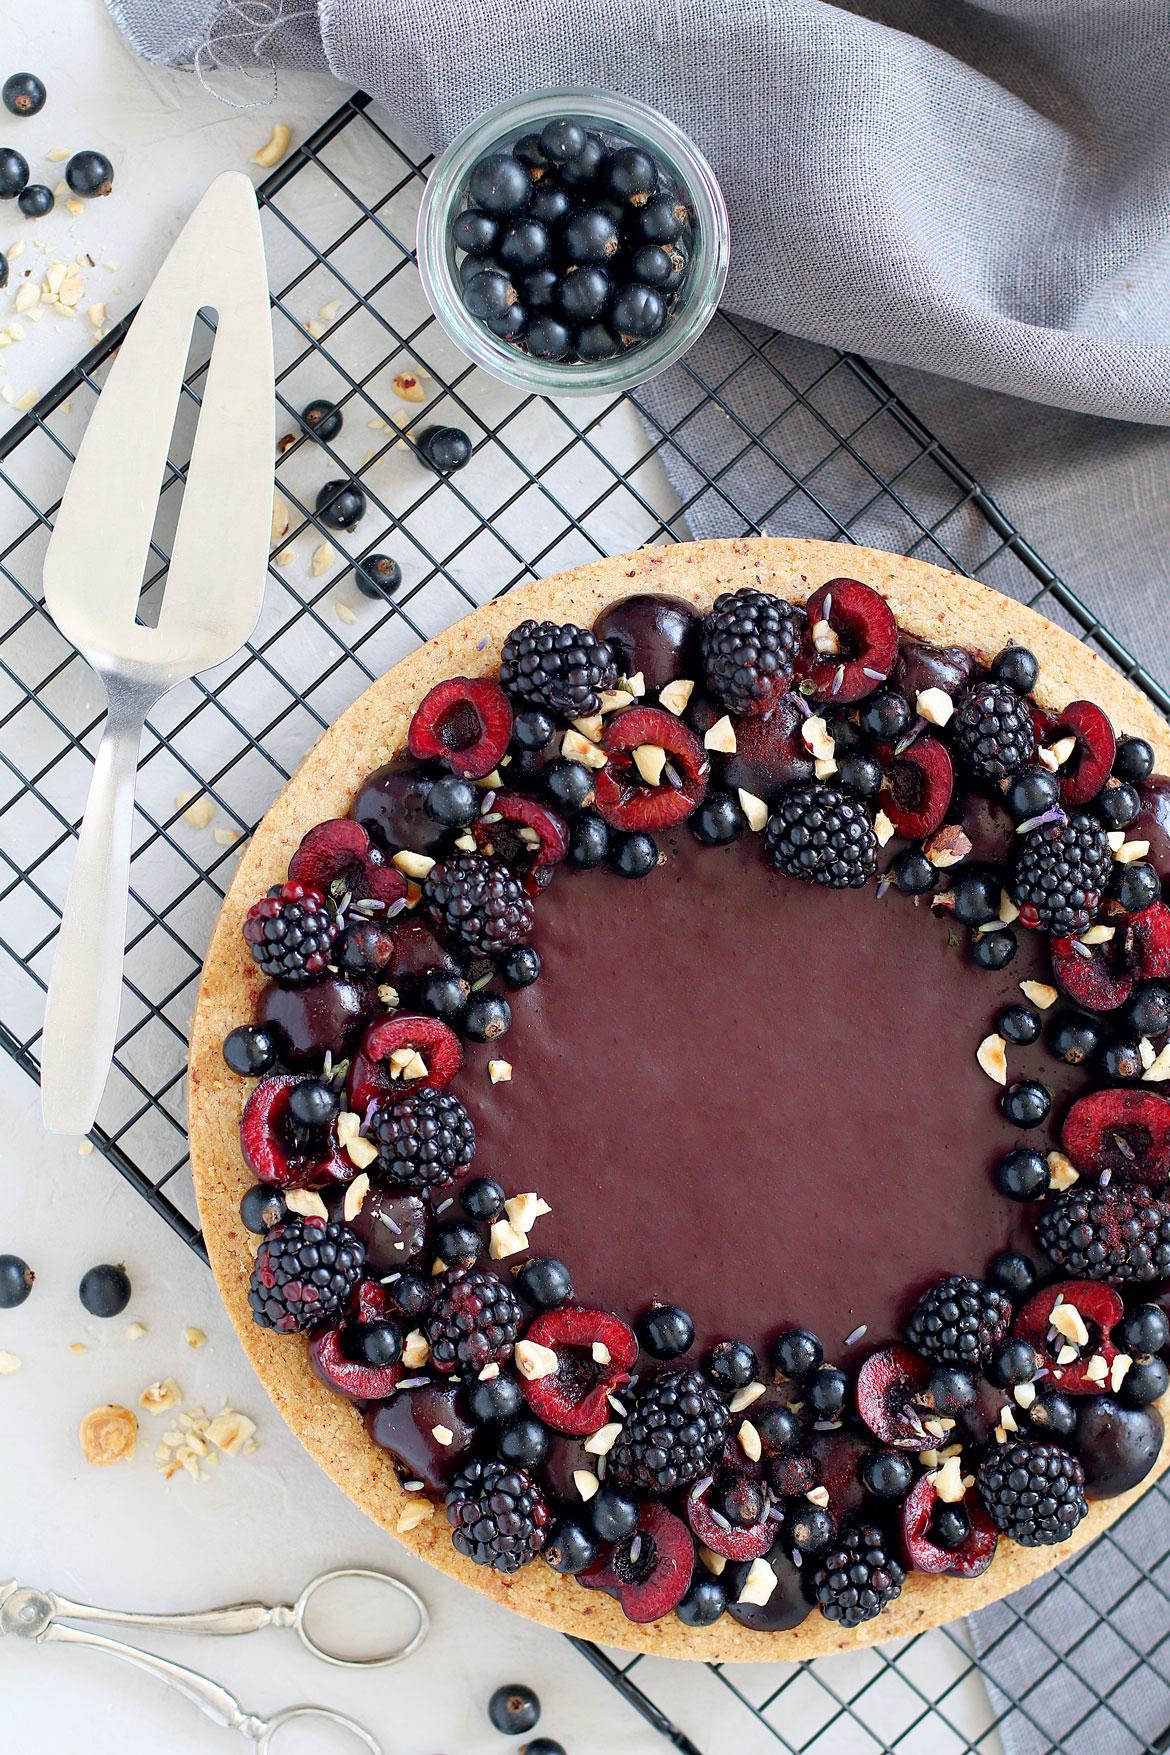 Blackcurrant Chocolate Tart (Gluten, Lactose Free) | stayforabite.com